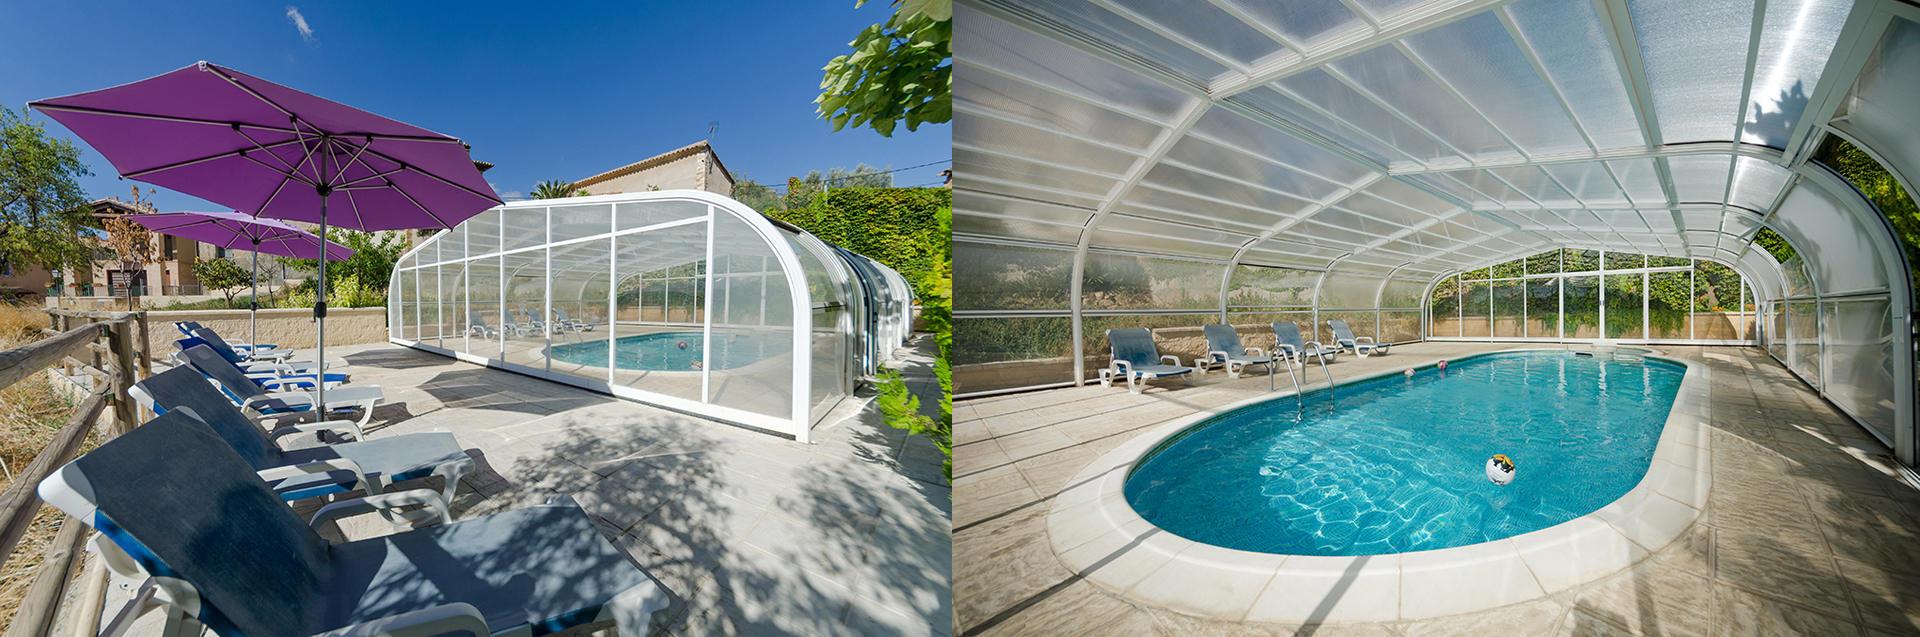 Casa rural alquezar piscina